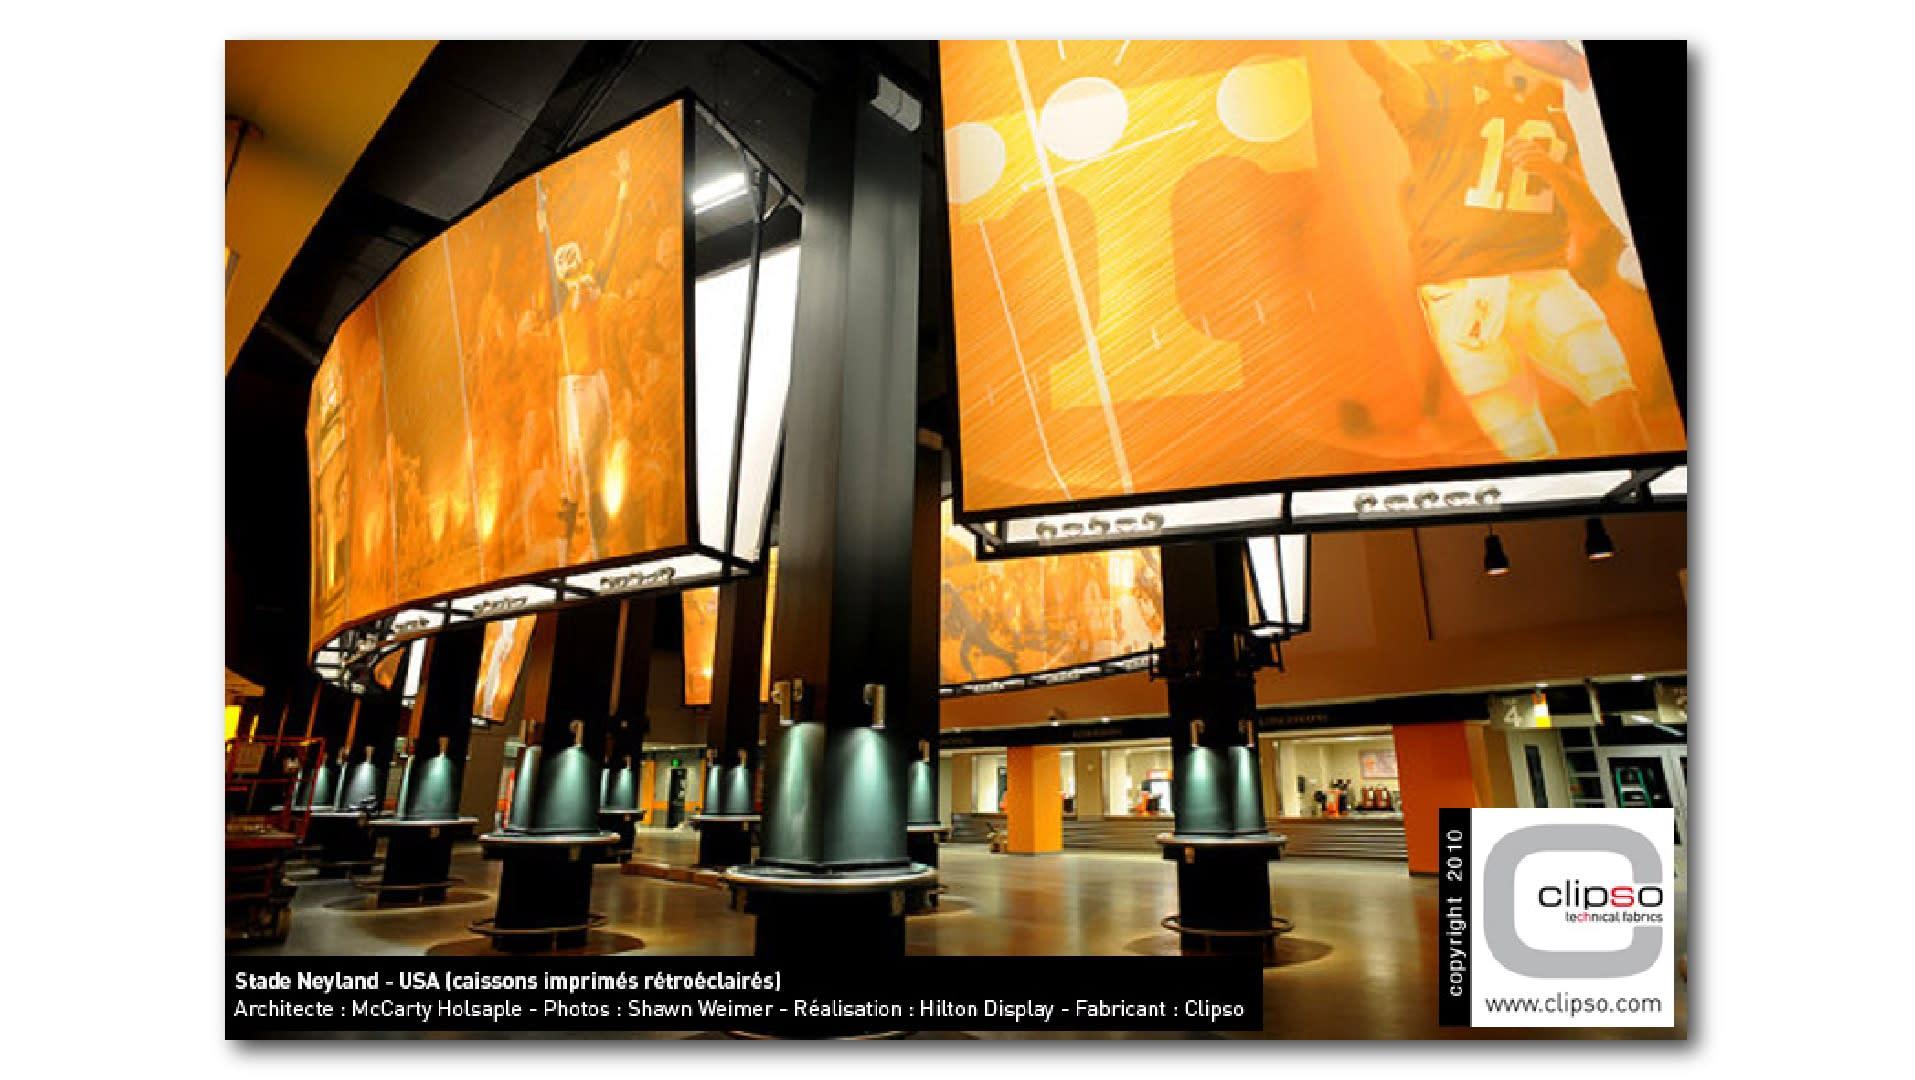 Deckensegel-flächig-hinterleuchtet-print-02-01_c58ciy